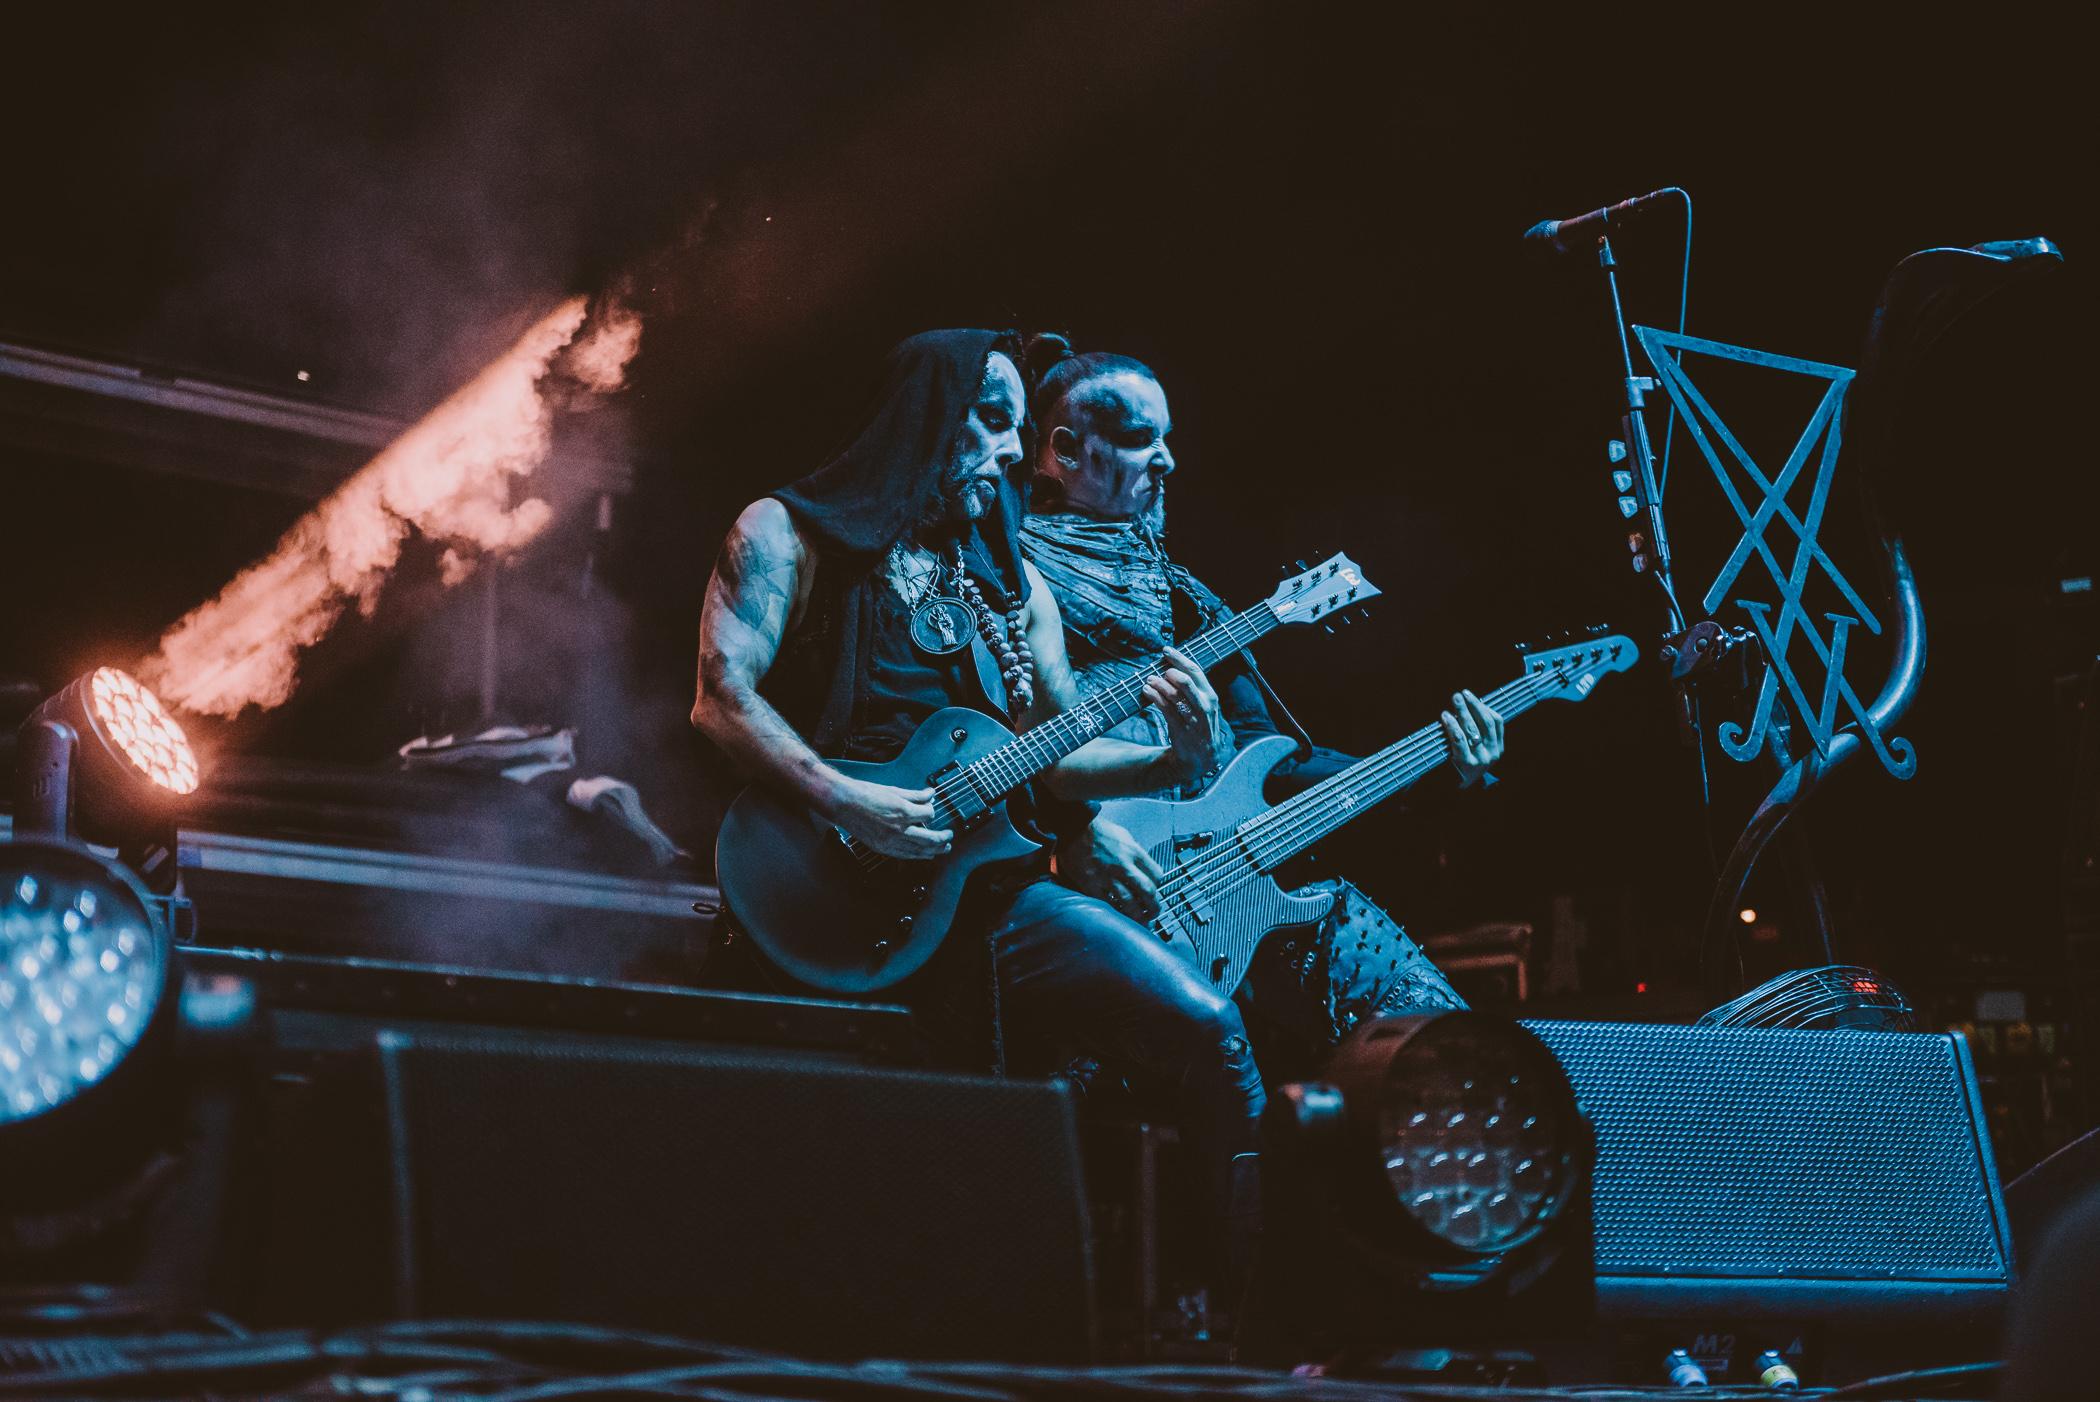 2_Behemoth-Pacific_Coliseum-Vancouver-Timothy_Nguyen-20180516 (10 of 32).jpg